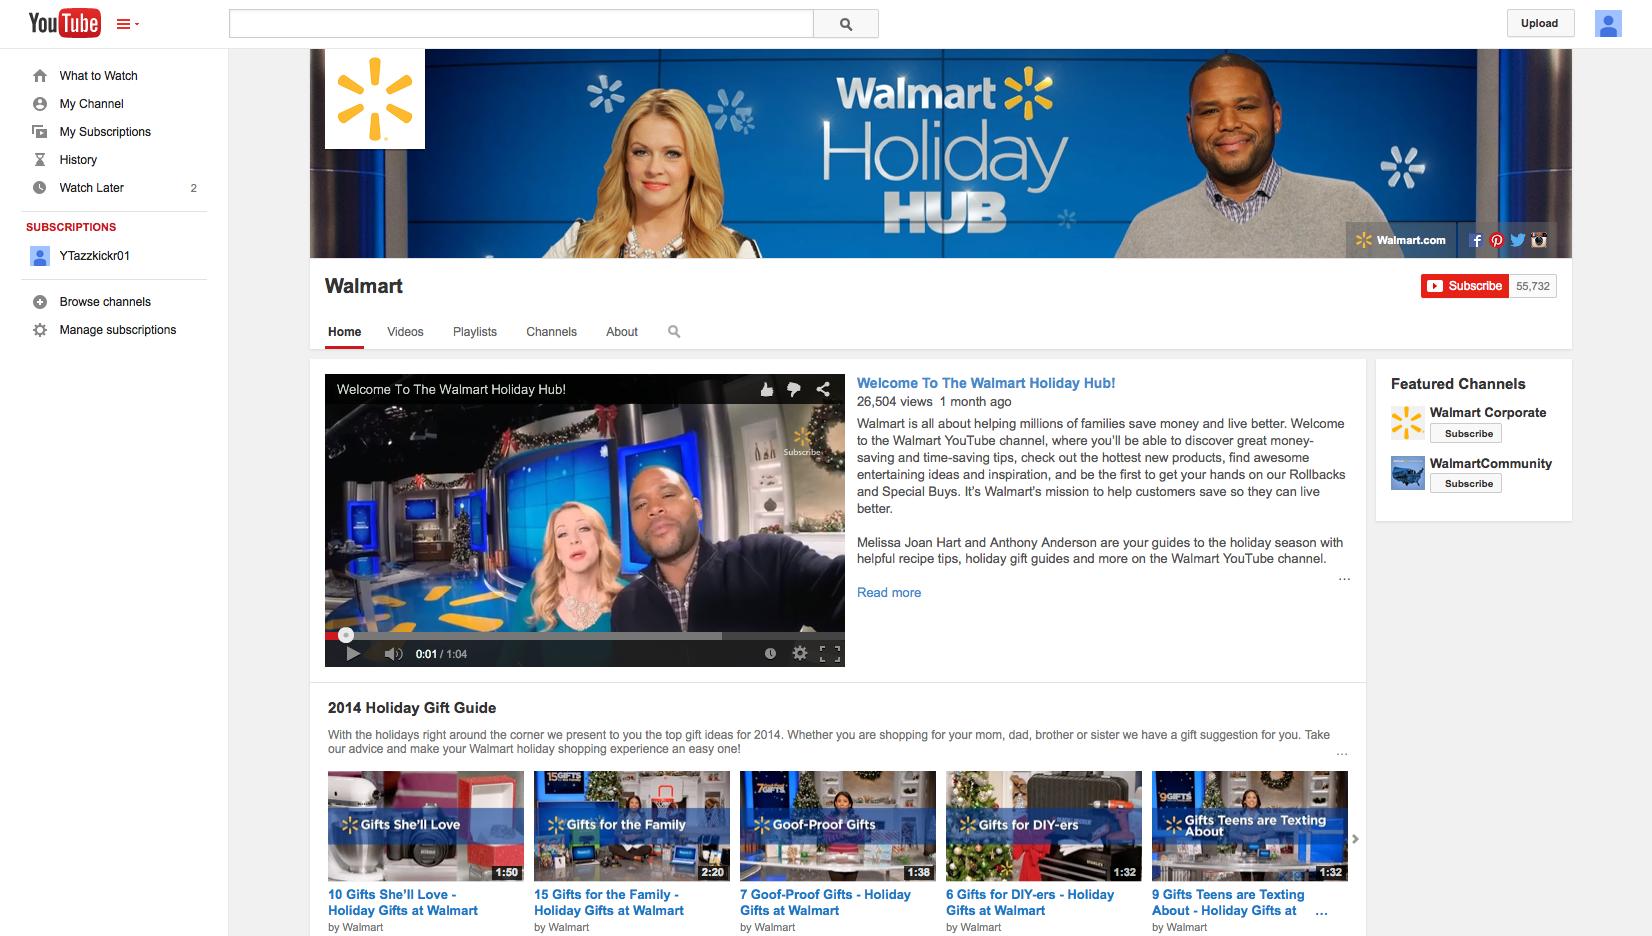 HolidayHub_Youtube.png